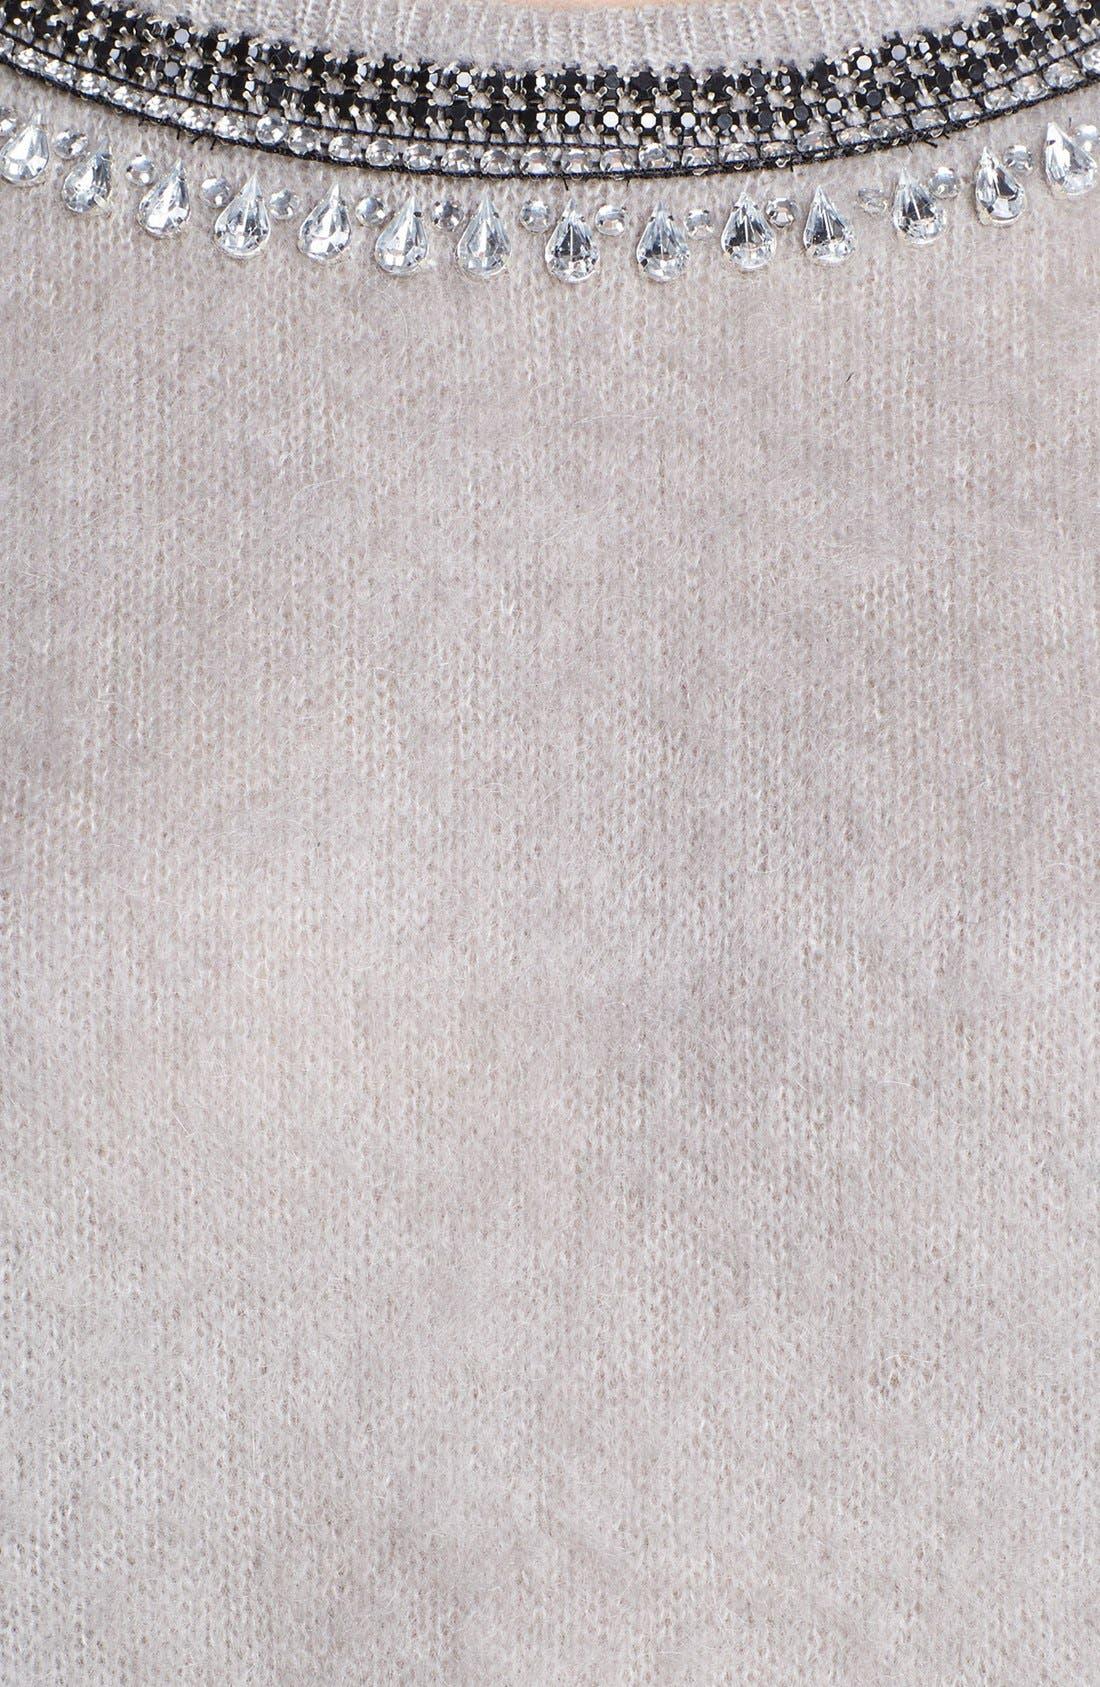 Jewel Neck Textured Sweater,                             Alternate thumbnail 3, color,                             020